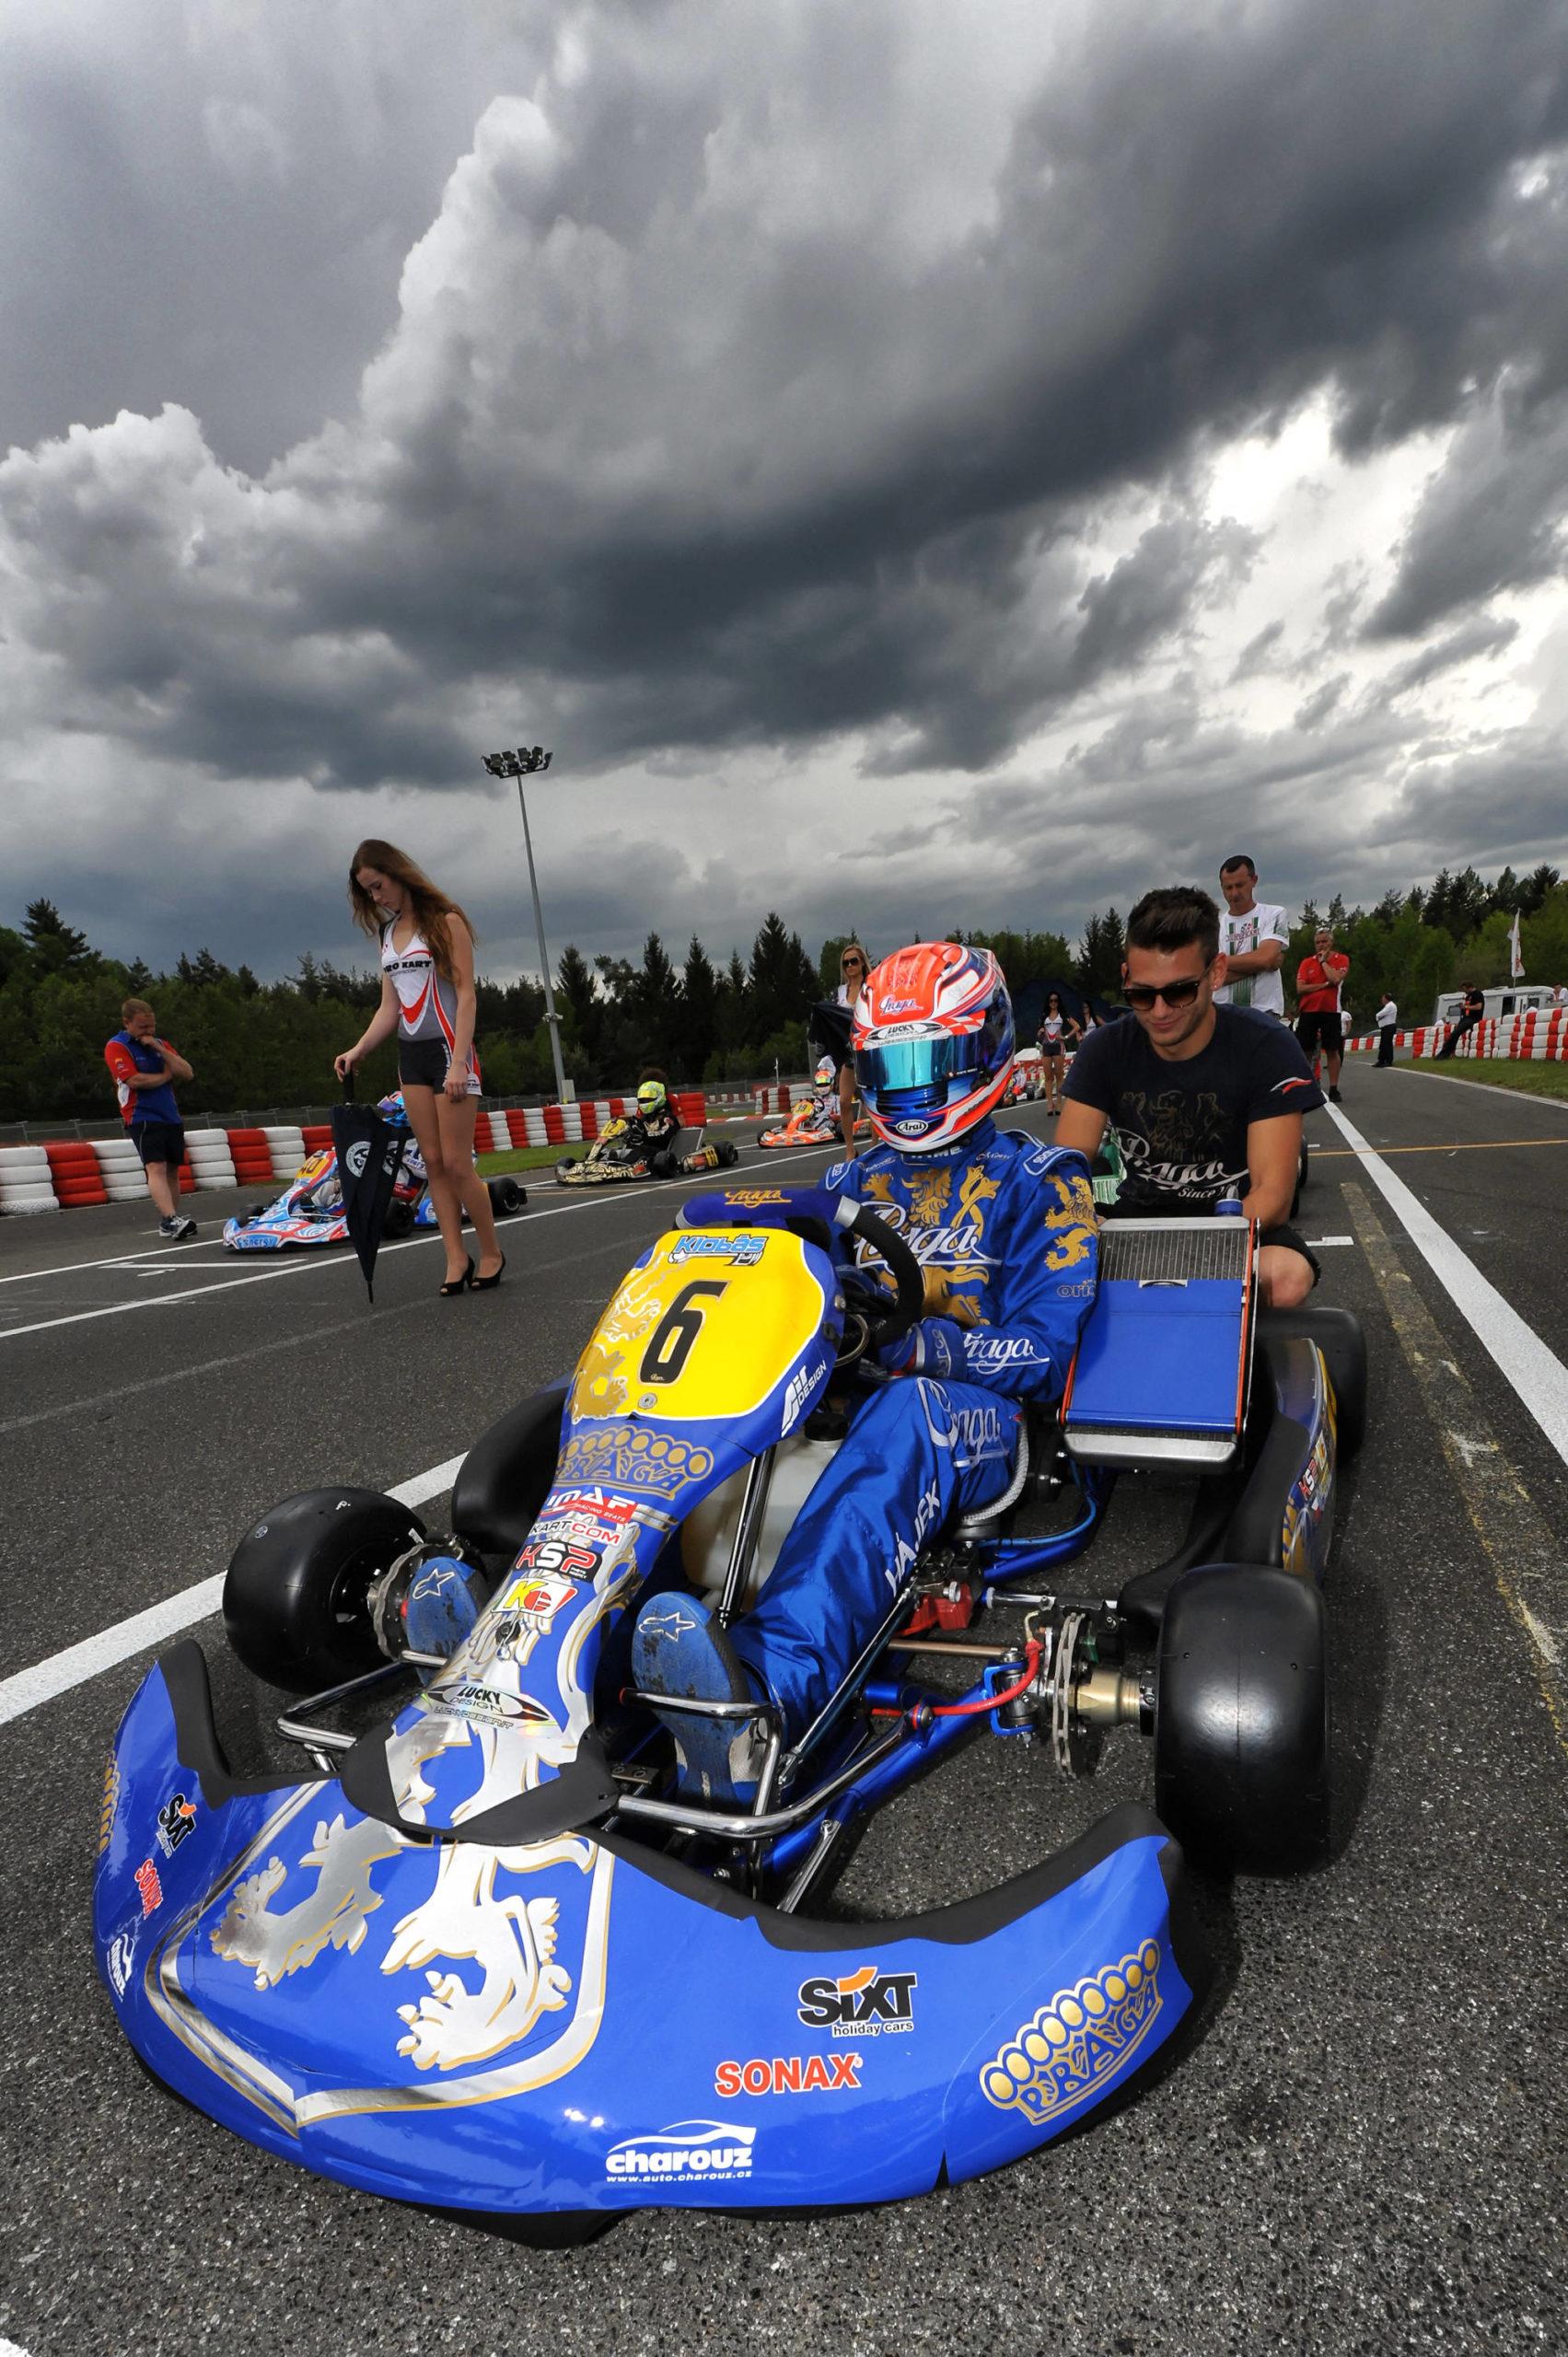 PRAGA In Top 10 at CIK-FIA European